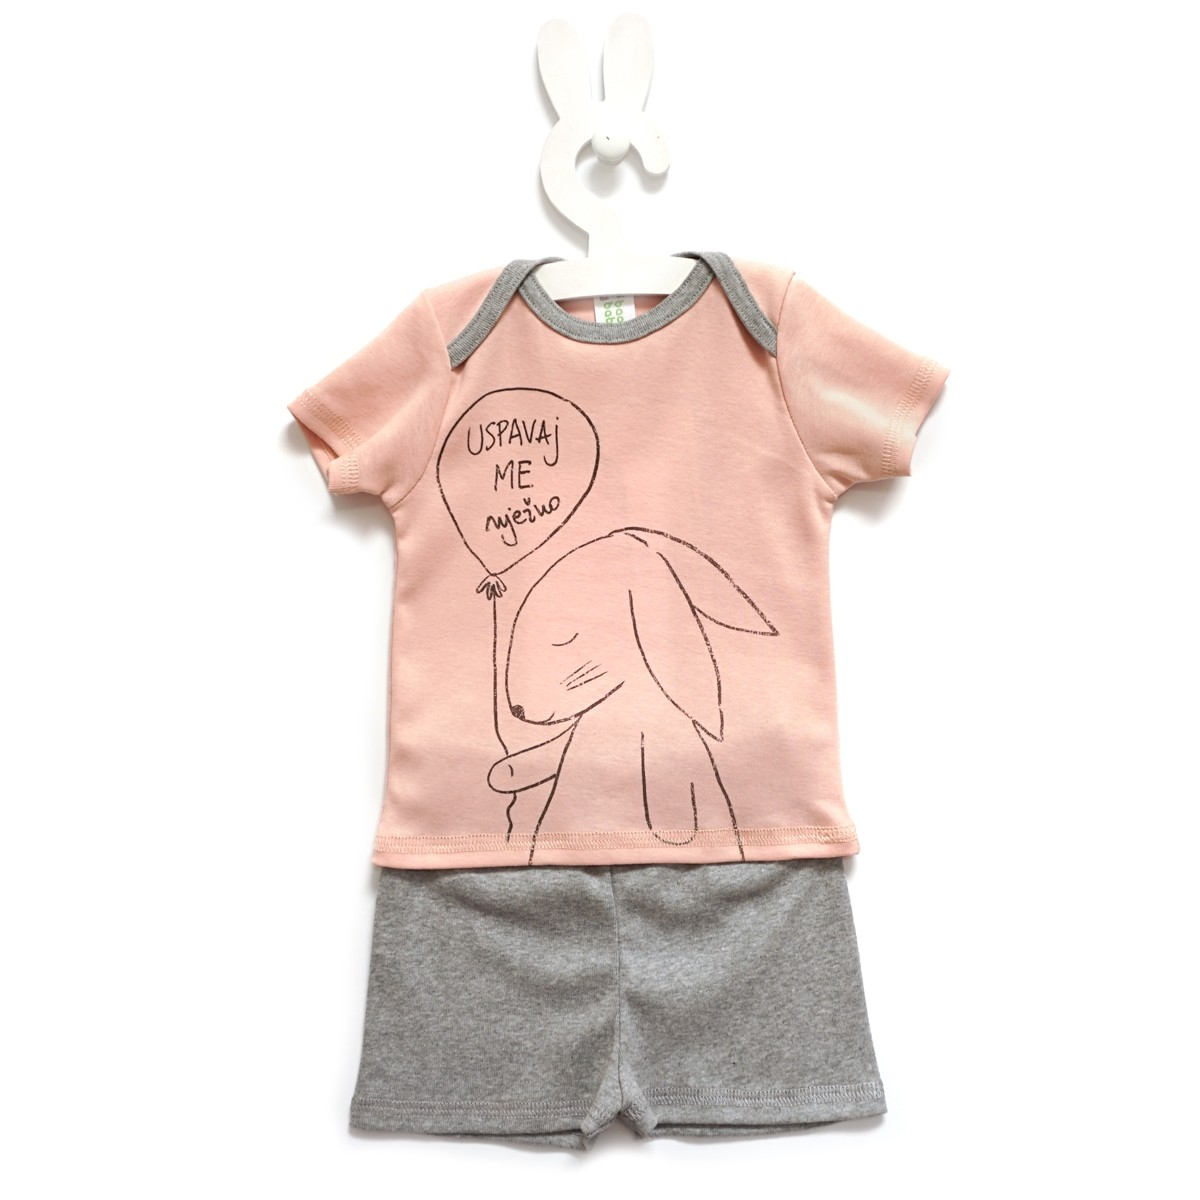 Baobaby pidžama KR - Uspavaj me nježno, rozo/siva